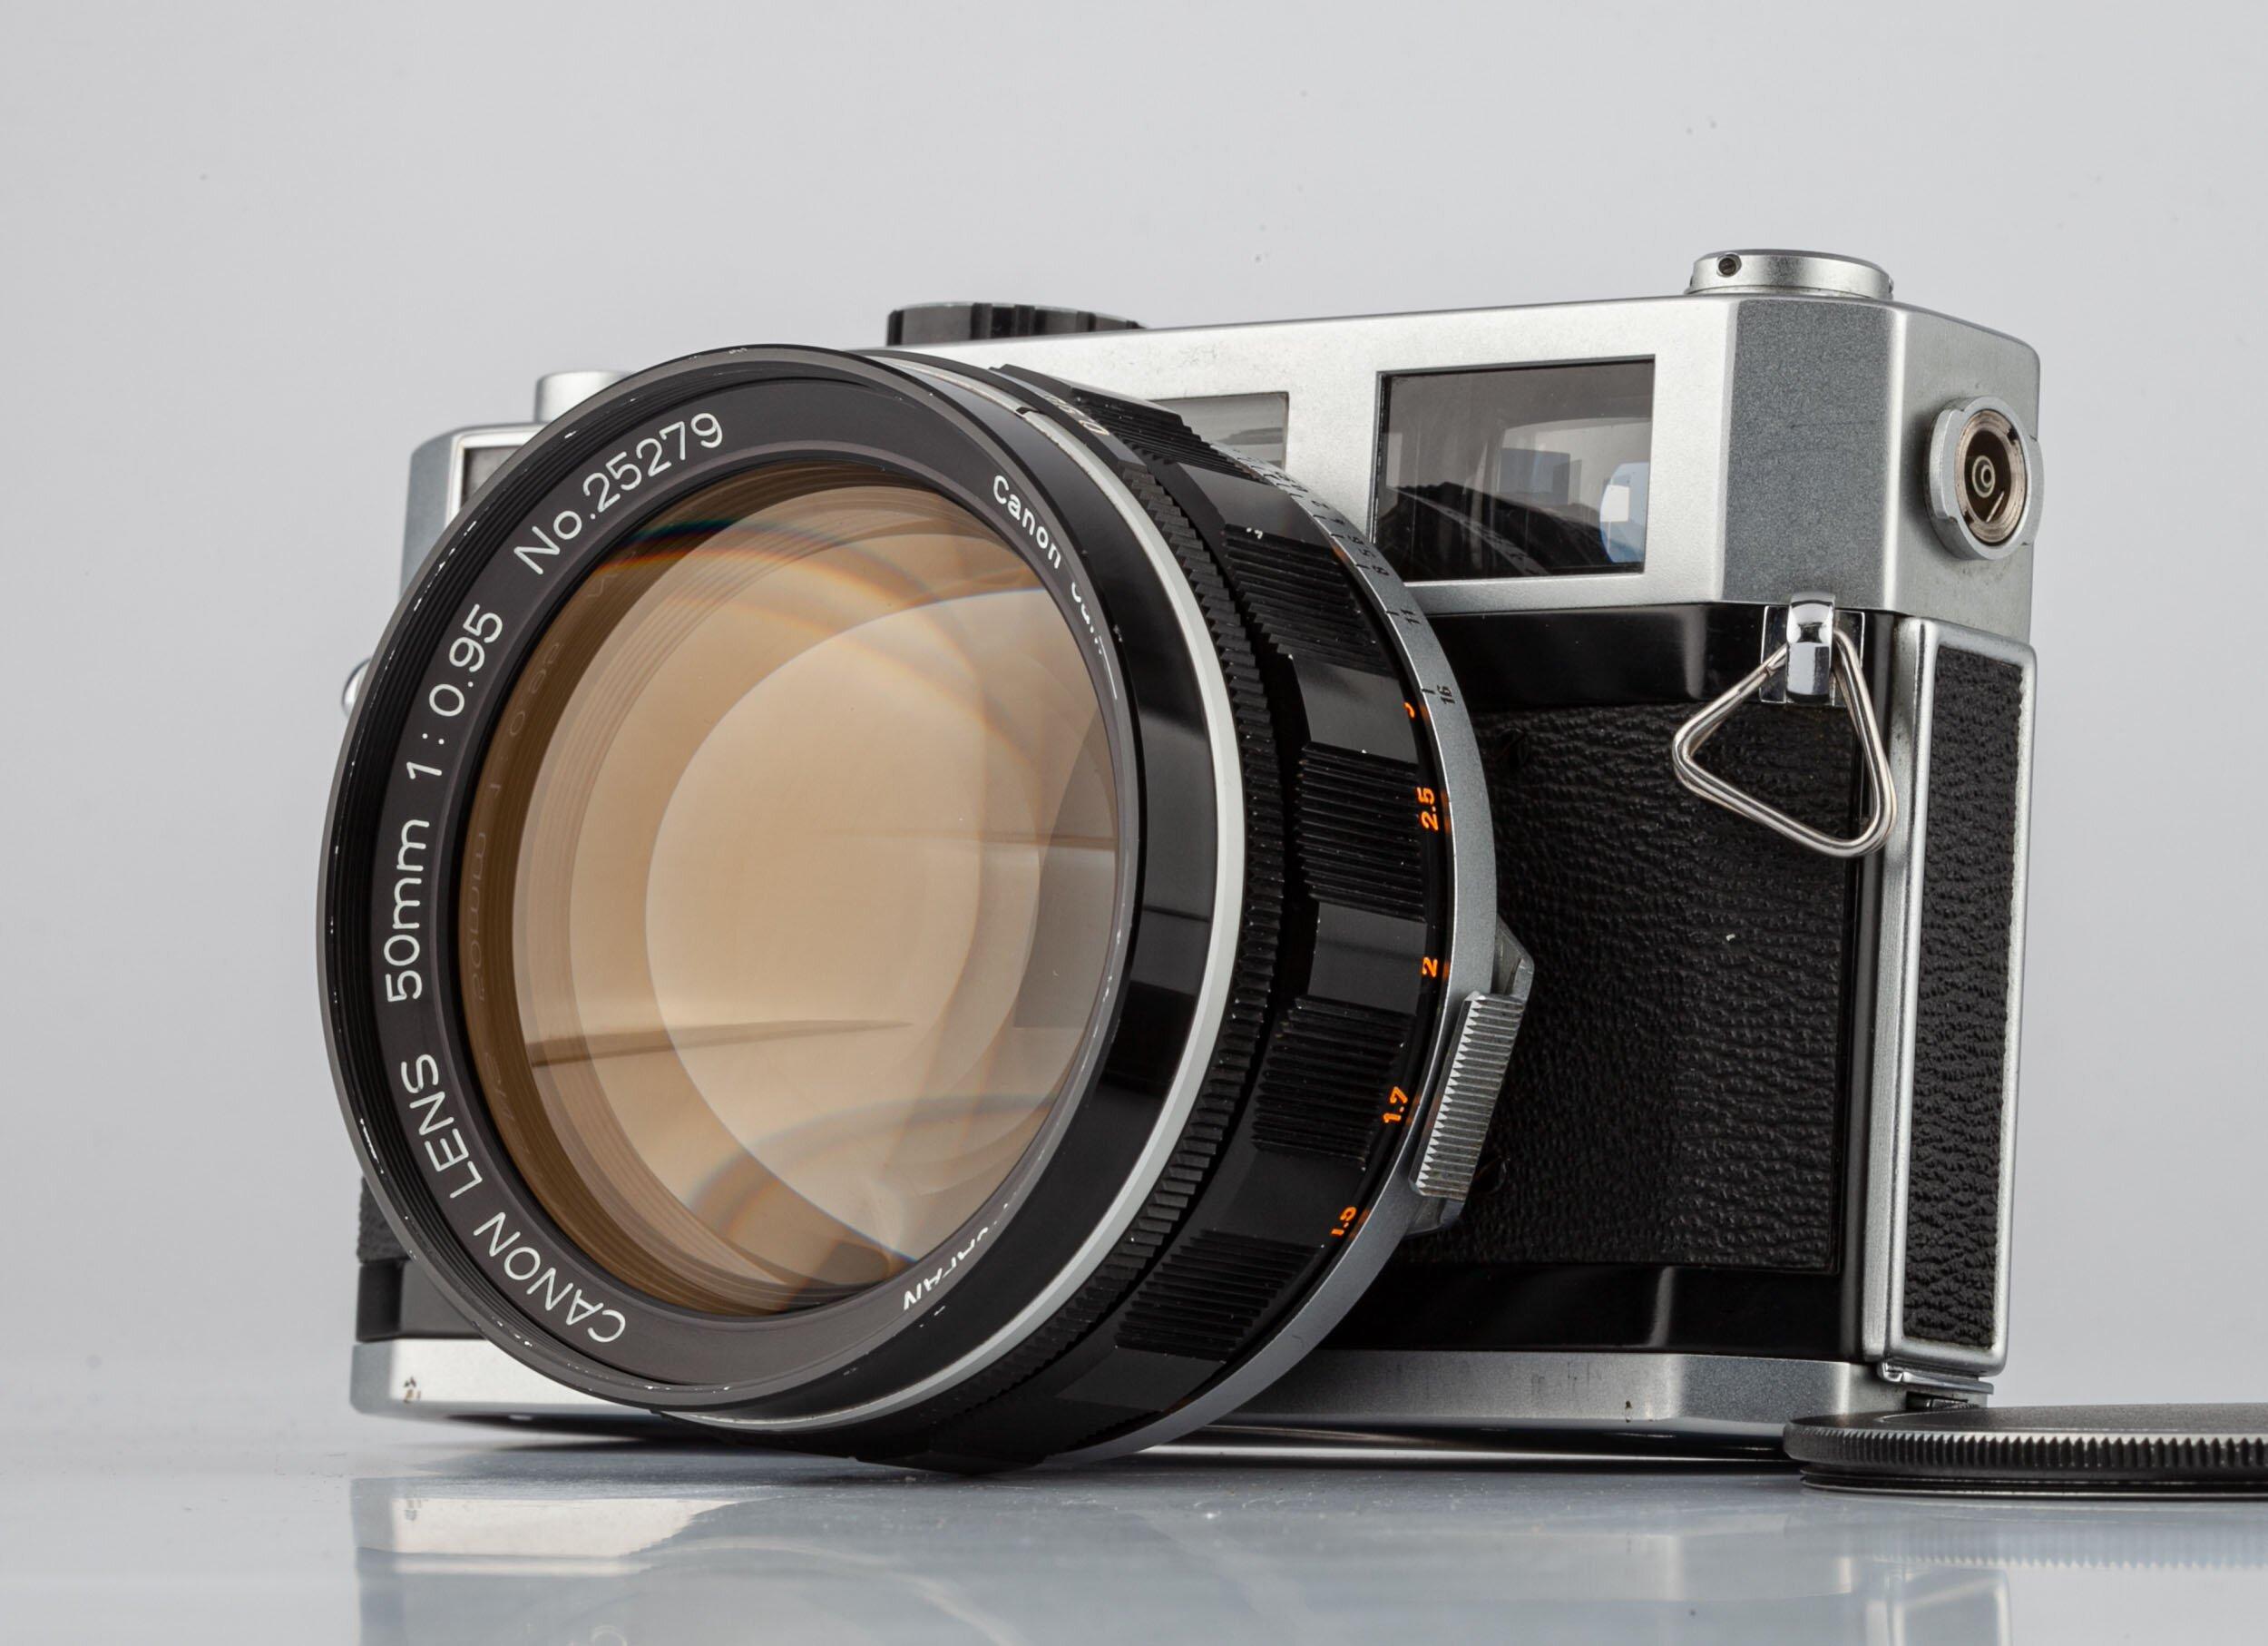 Canon 7 Canon Lens 0,95/50mm Messsucher-Kamera